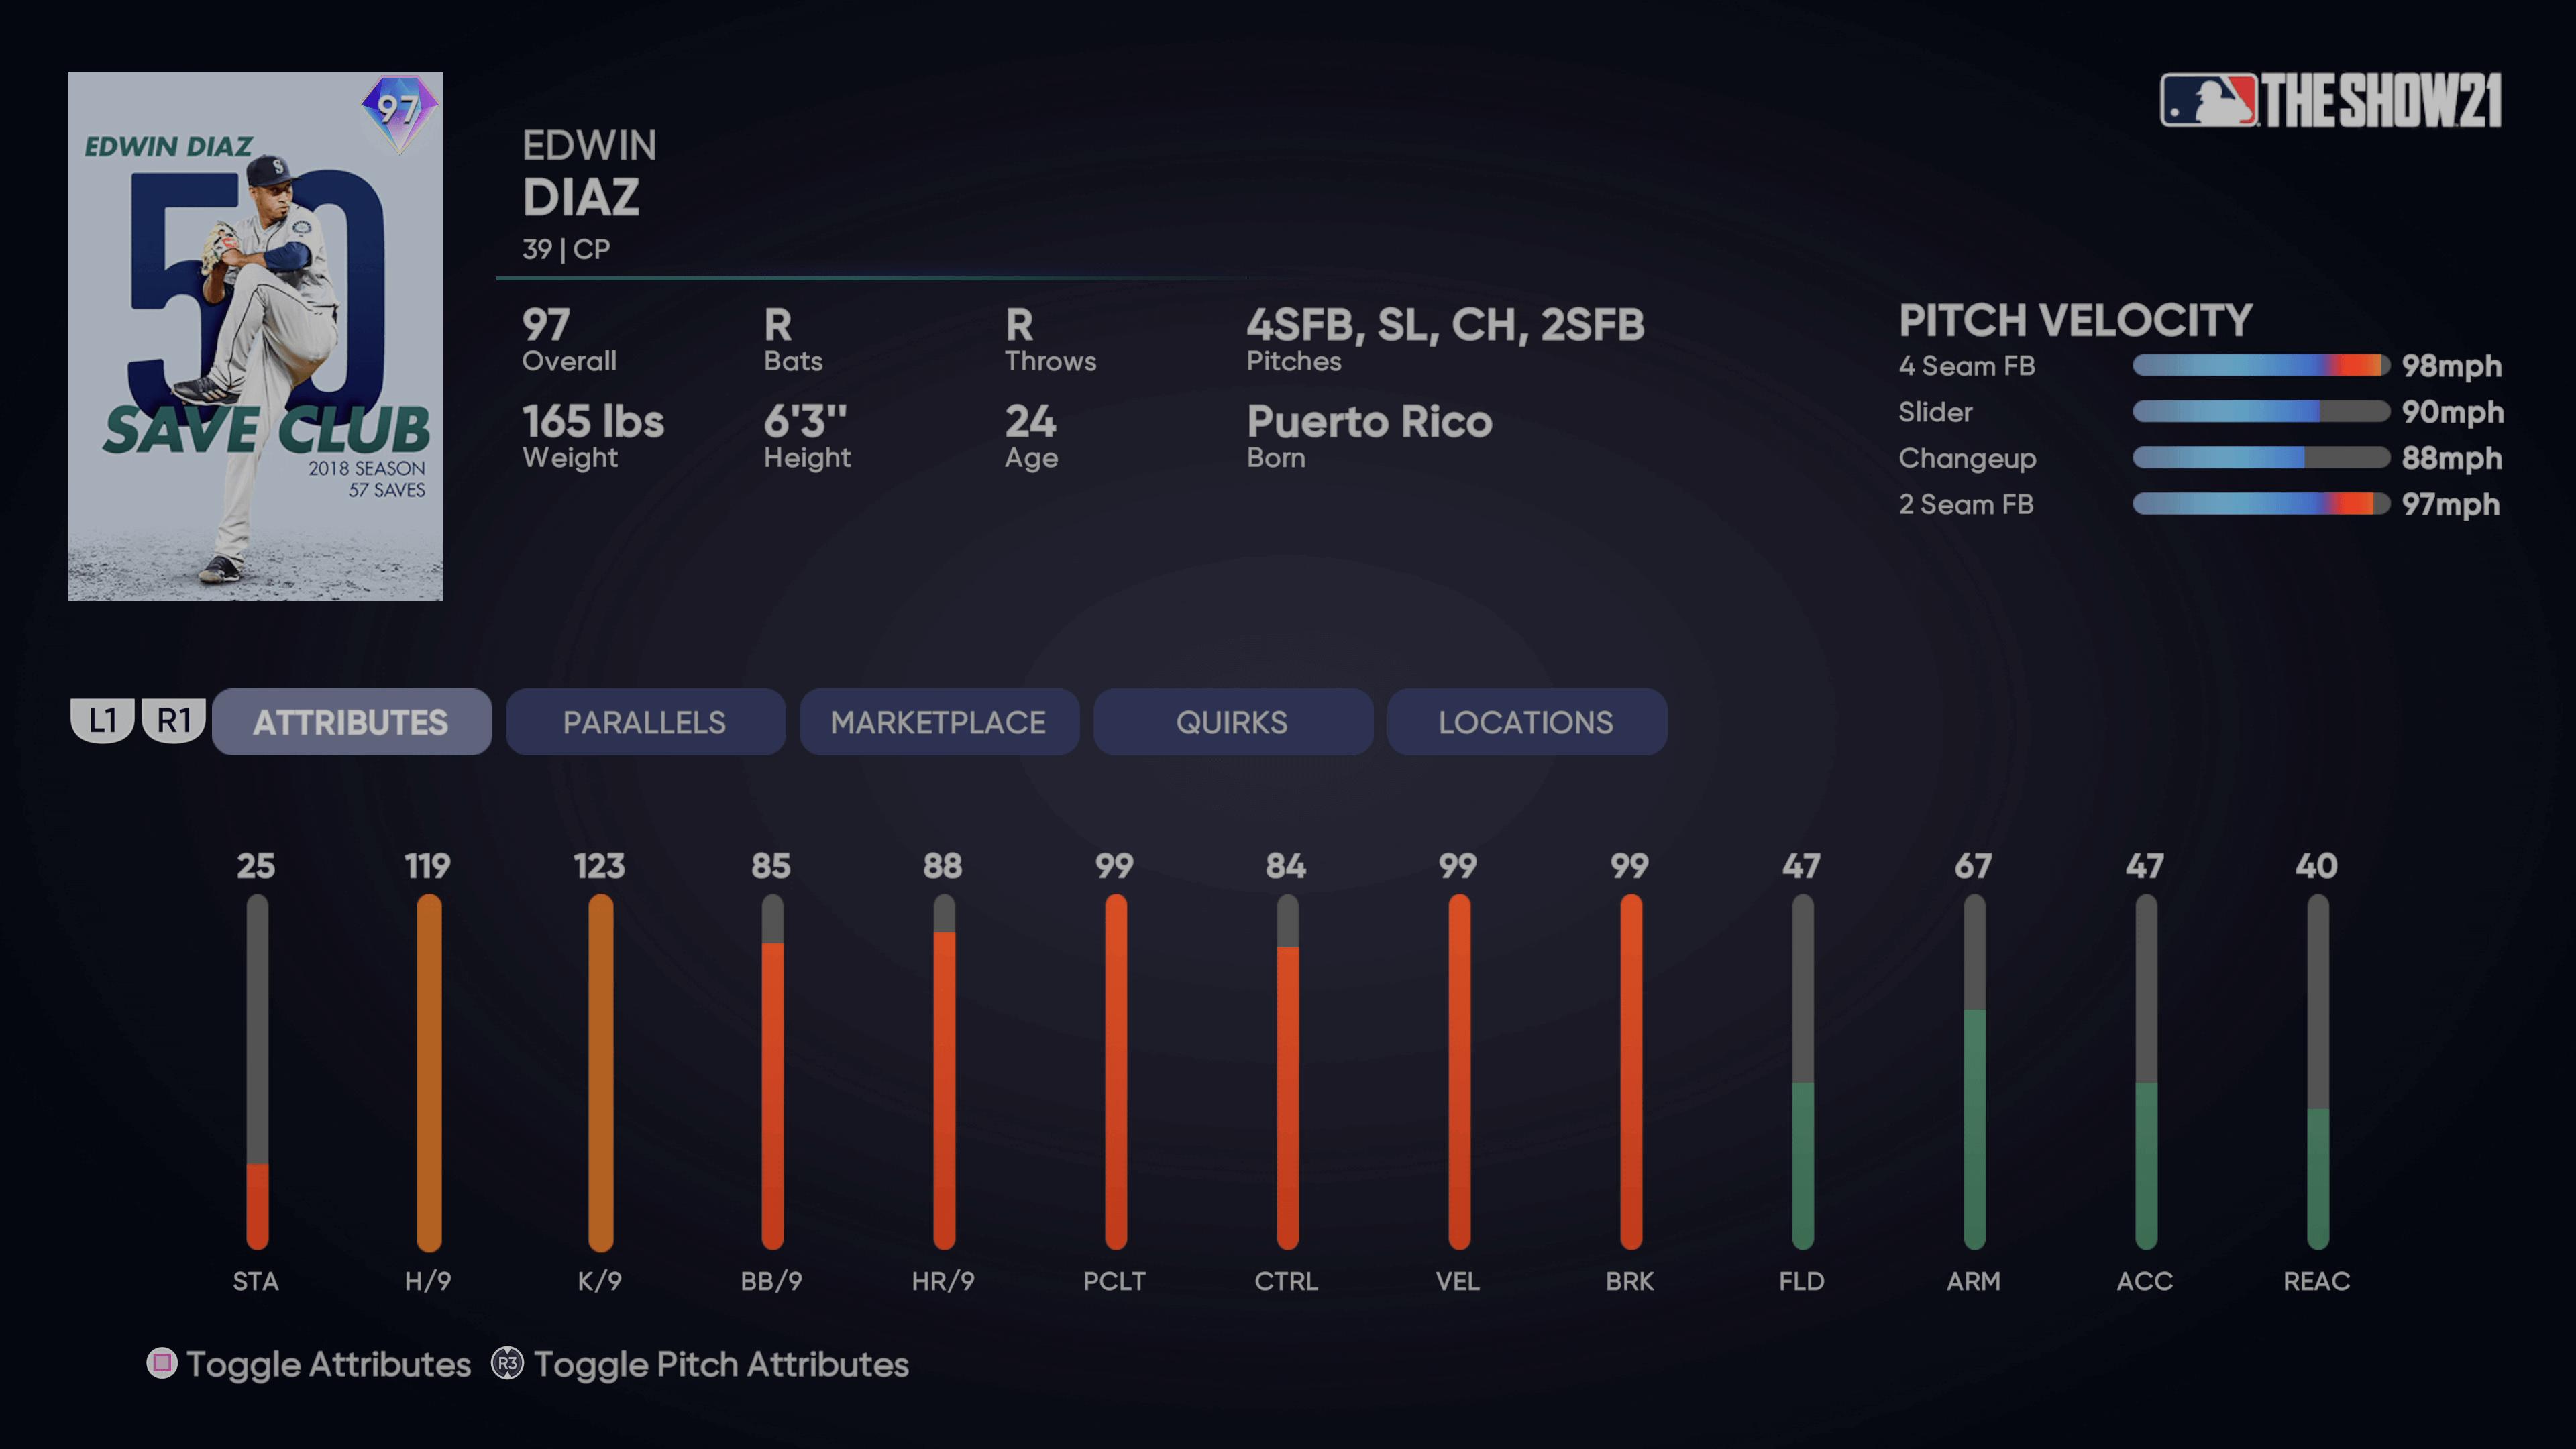 MLB The Show 21 - Headliners Set 30 Milestone Edwin Diaz_2021-08-13_15-14-26